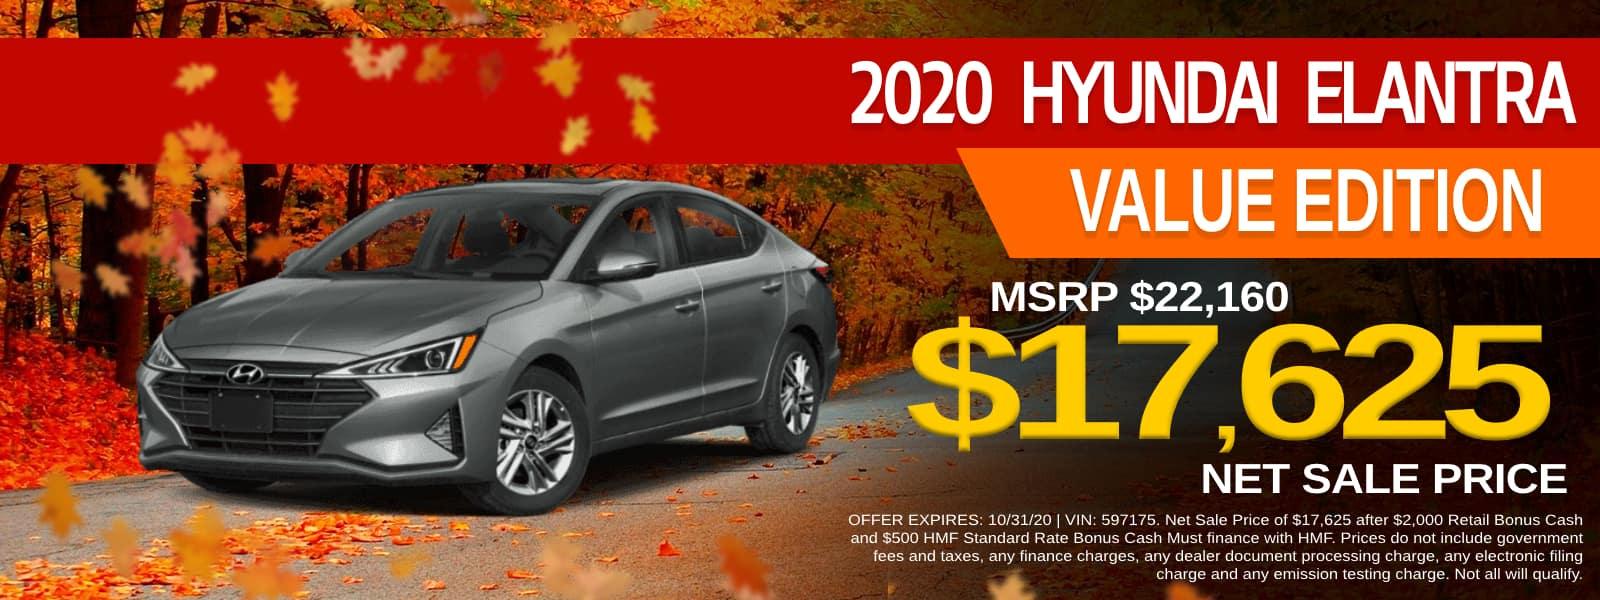 2020 Hyundai Elantra Value